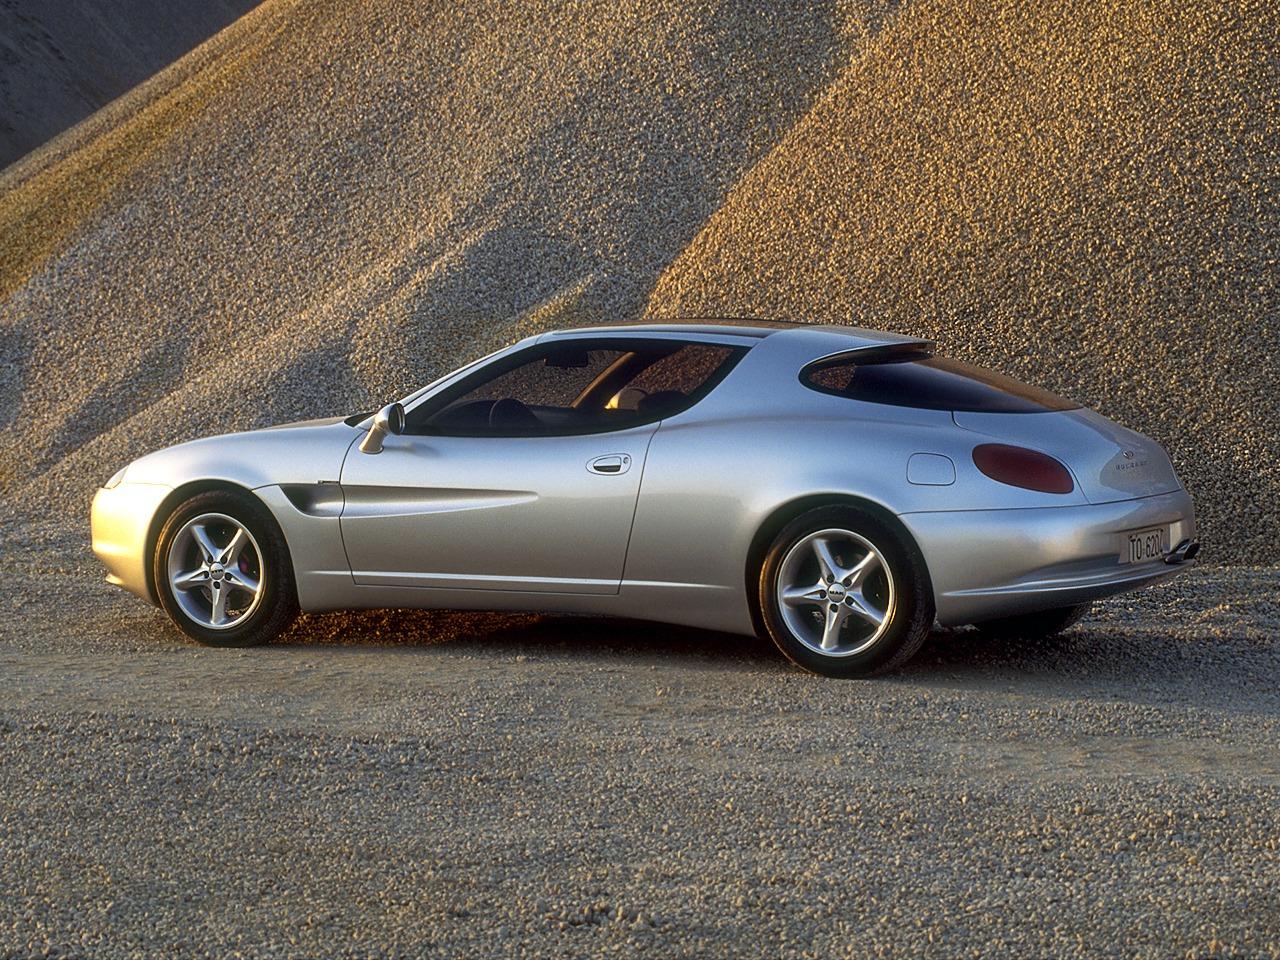 Subaru Dealer Near Me >> Daewoo Bucrane Concept (1995) - Old Concept Cars